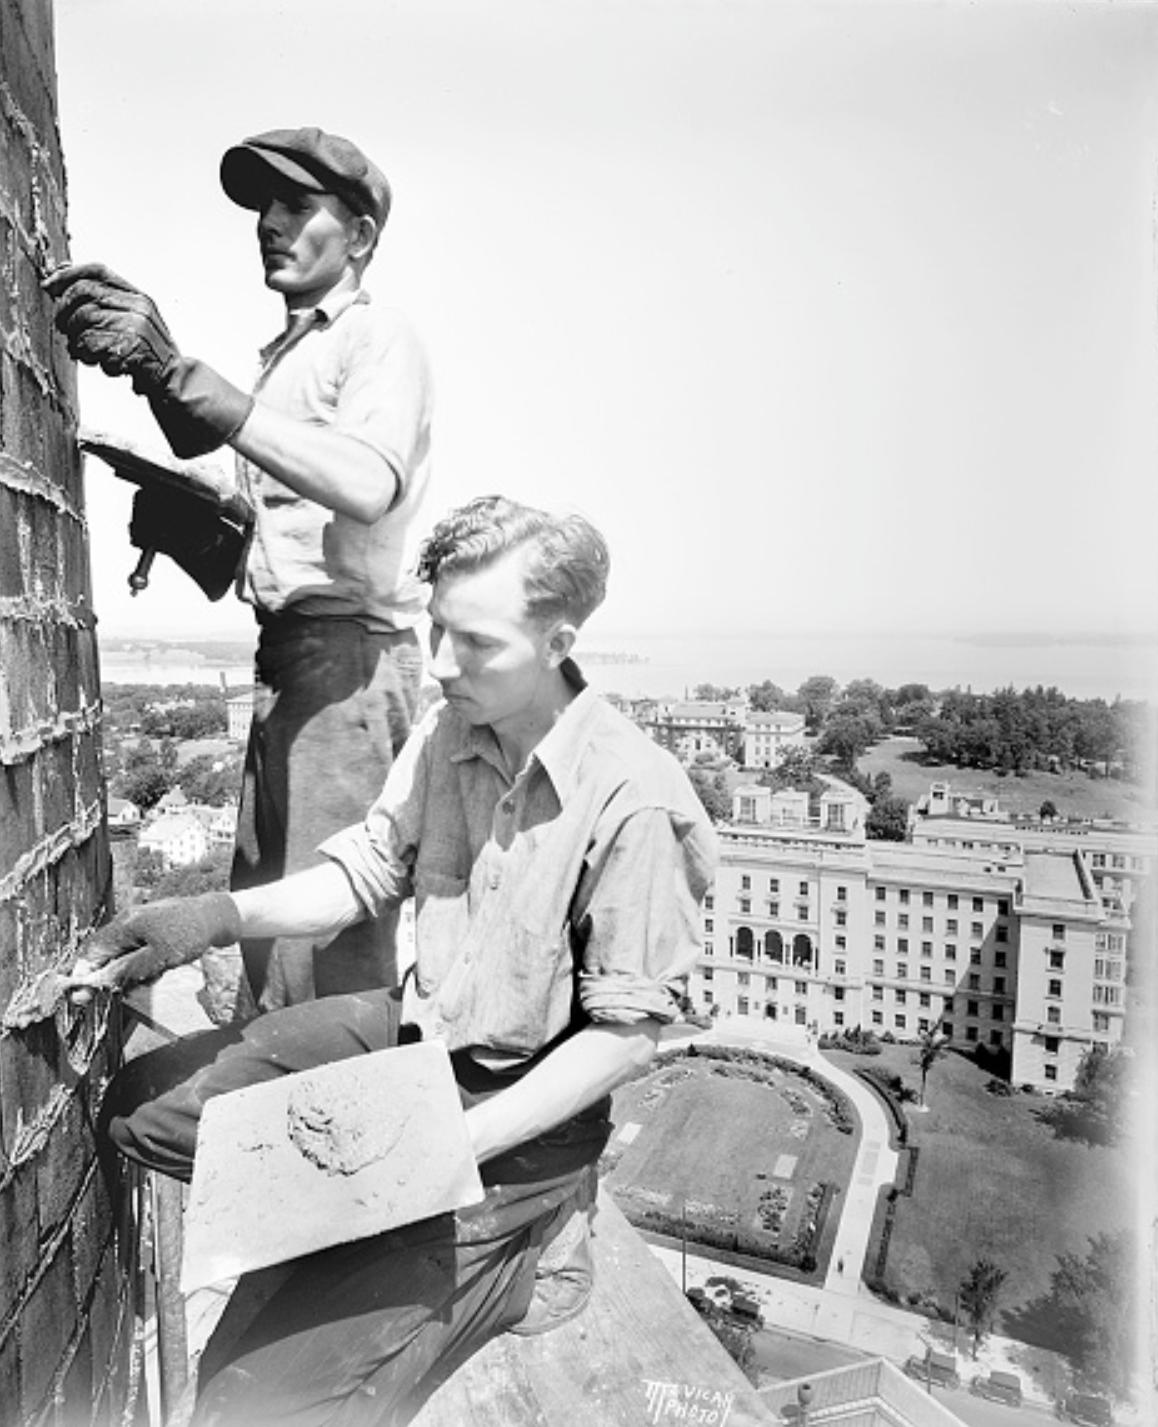 Рабочие. США, г. Мэдисон, штат Висконсин, 1931 г.